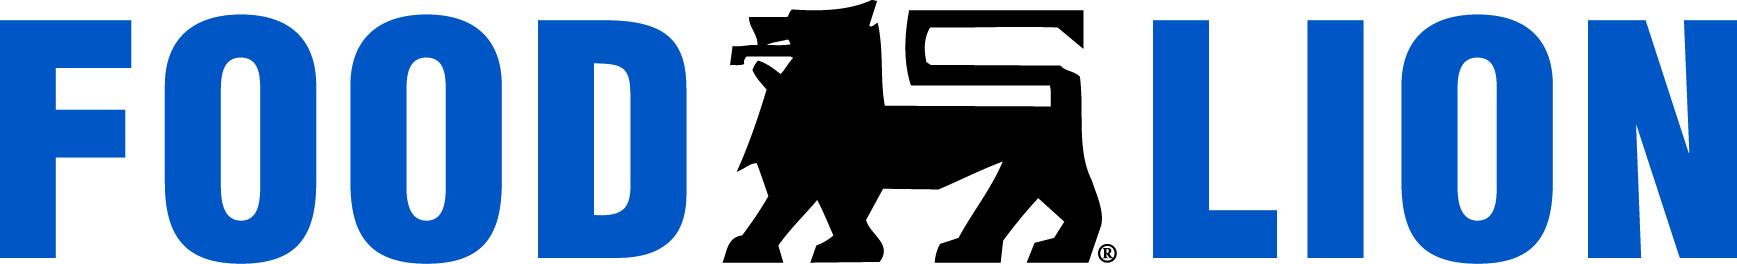 FoodLion_Logotype_Horiz_CMYK 2